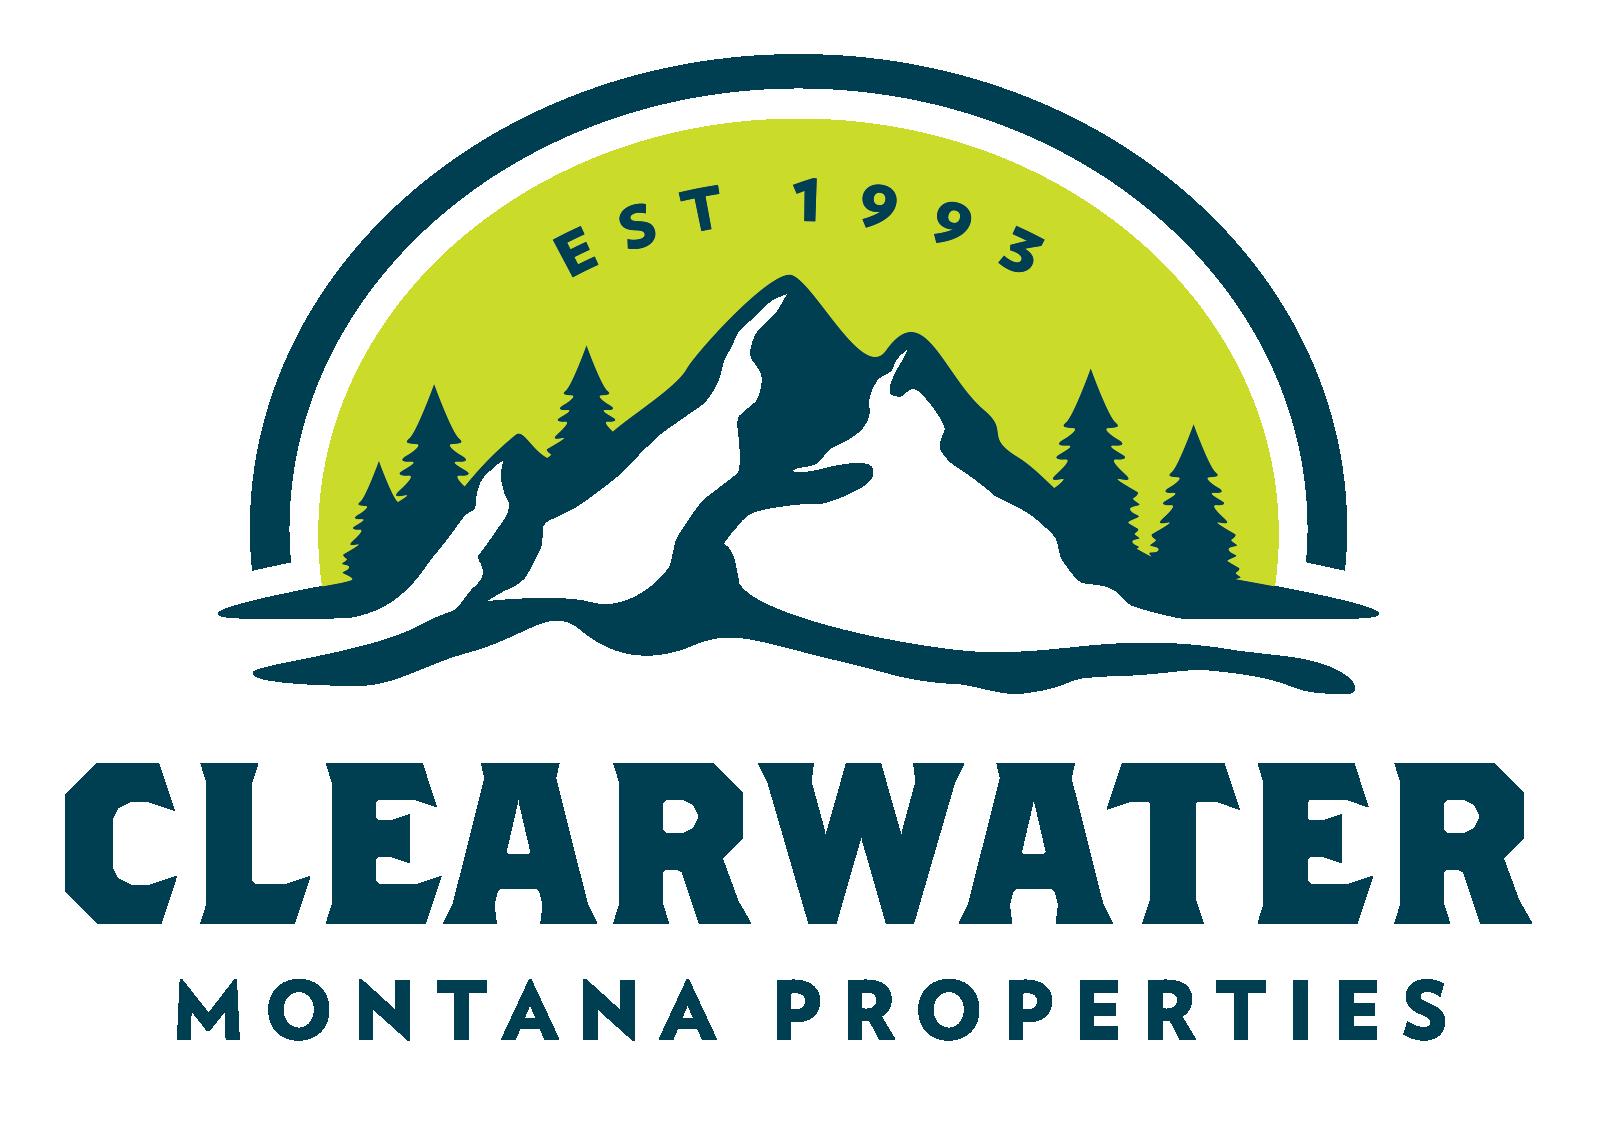 ClearwaterMTProperties_Logo_GreenBackground.png